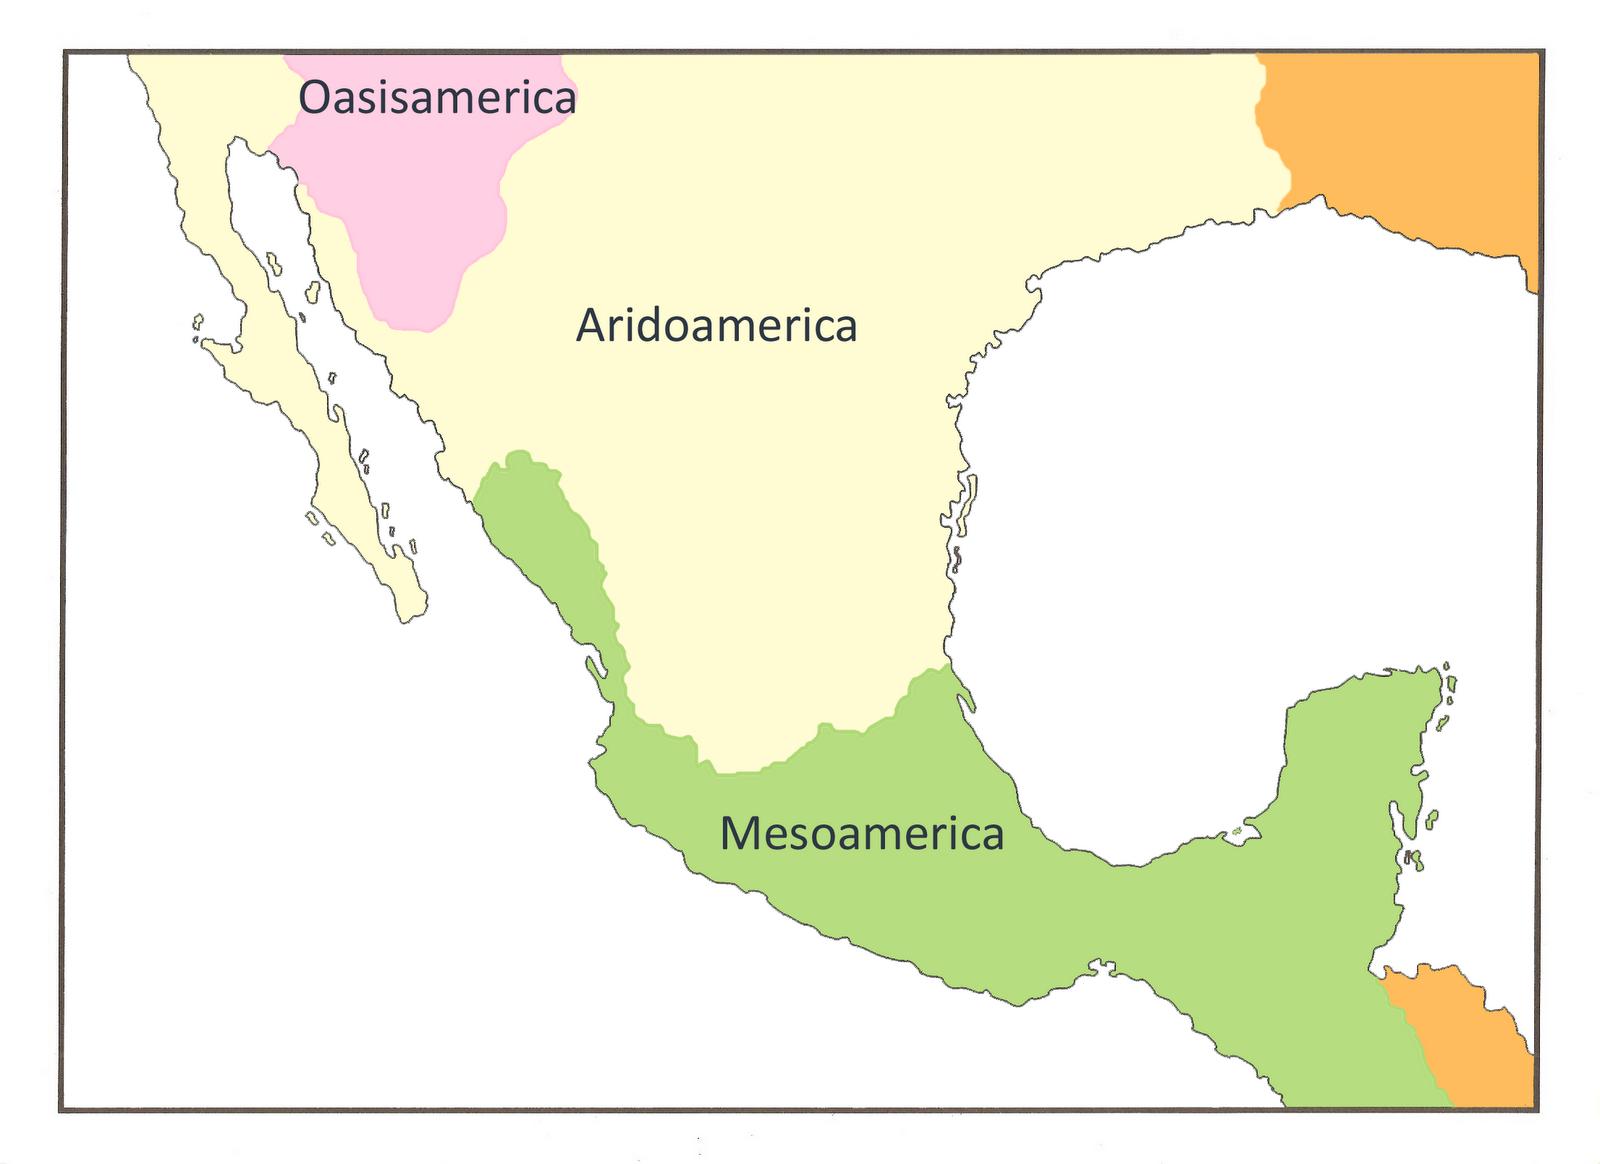 1 Mesoamerica y Aridoamerica